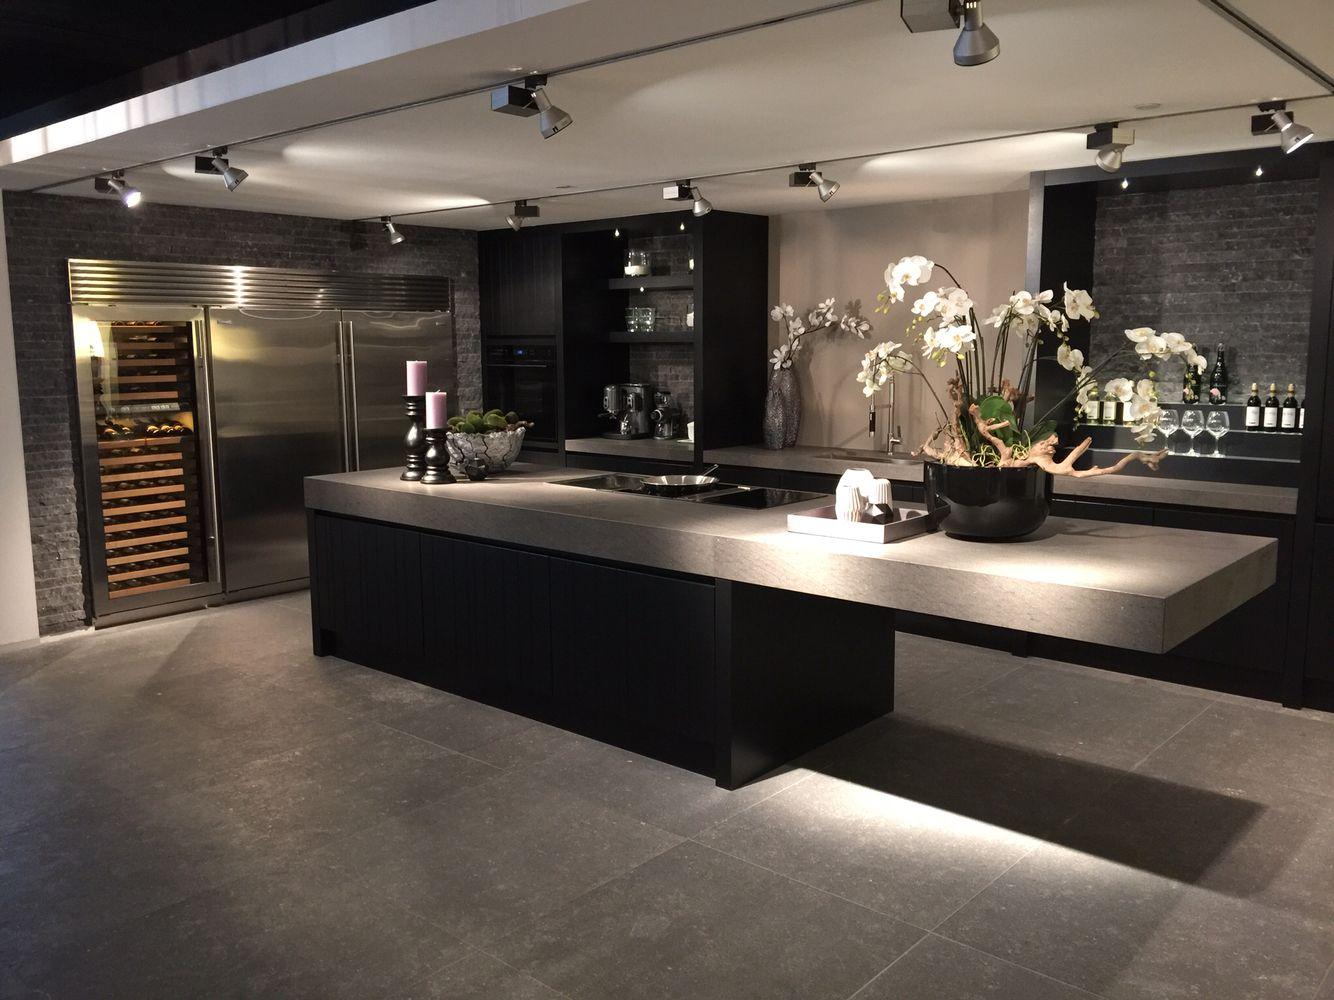 Mandemakers keuken rotterdam extra kamer maken op zolder beste